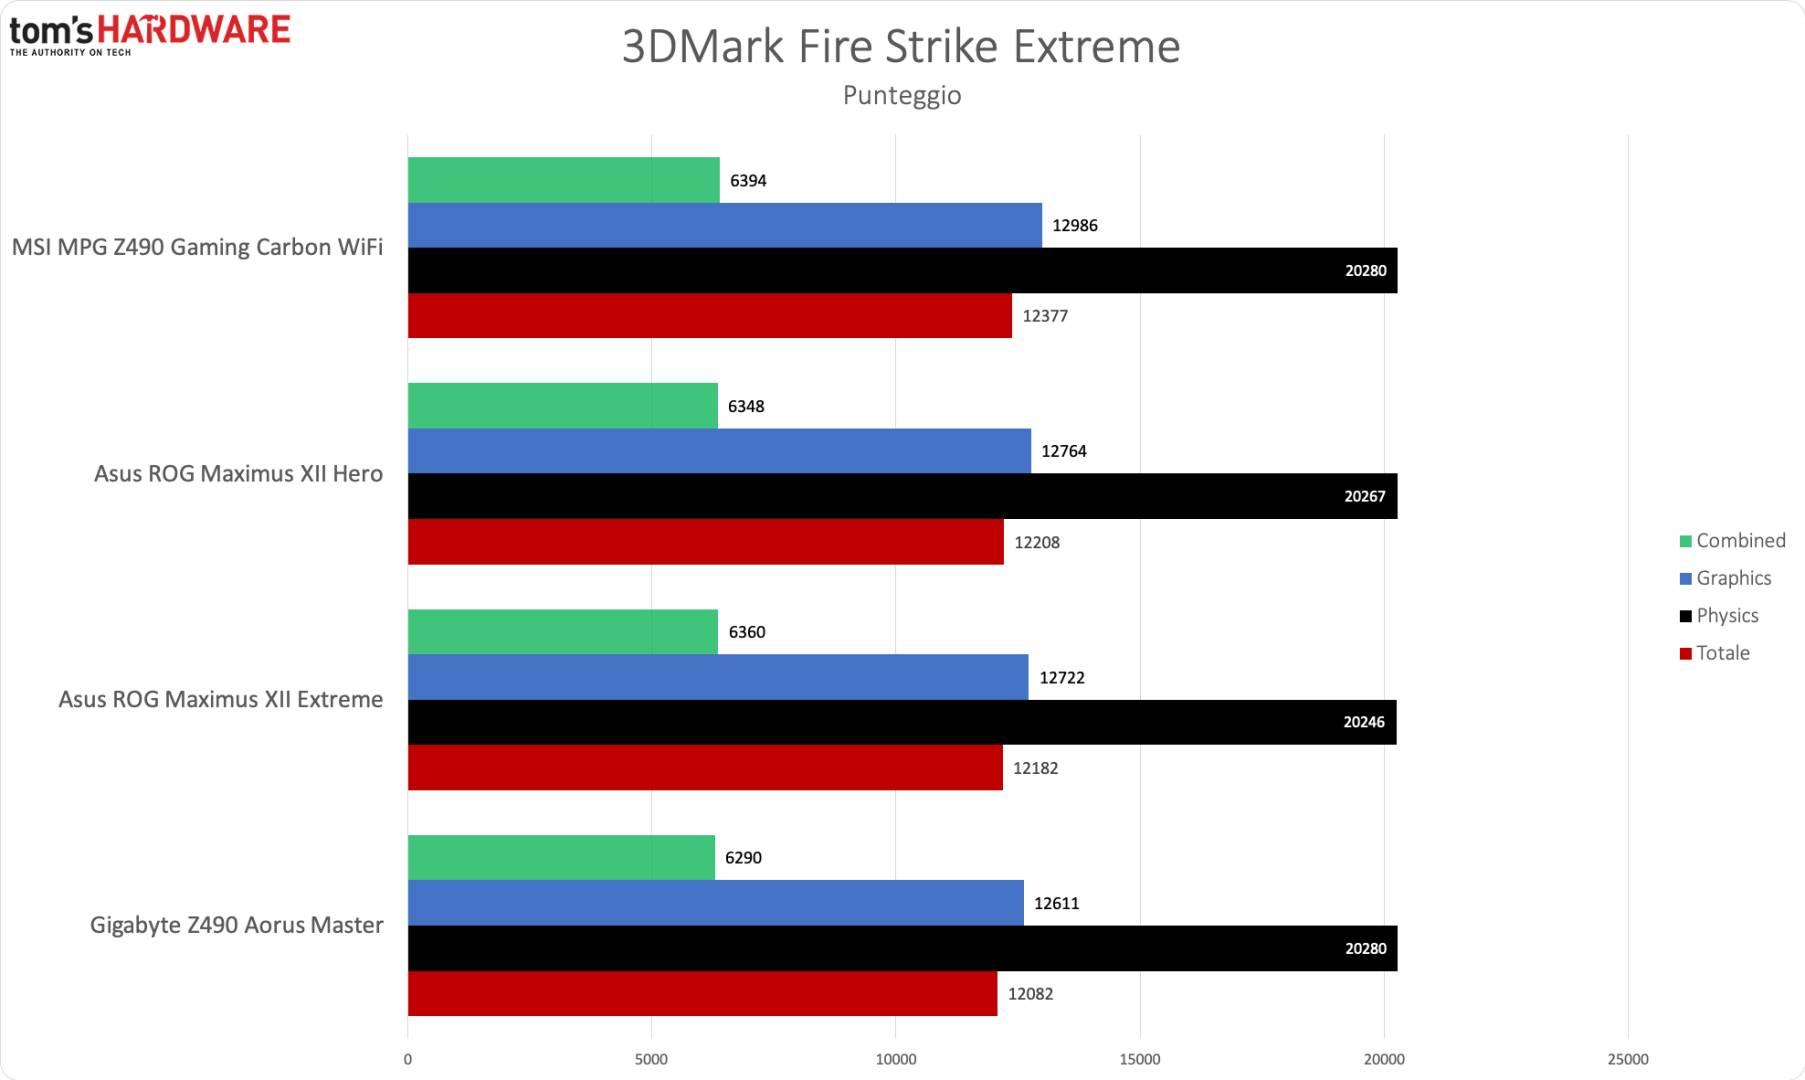 MSI Z490 Gaming Carbon WiFi - 3DM Fire Strike